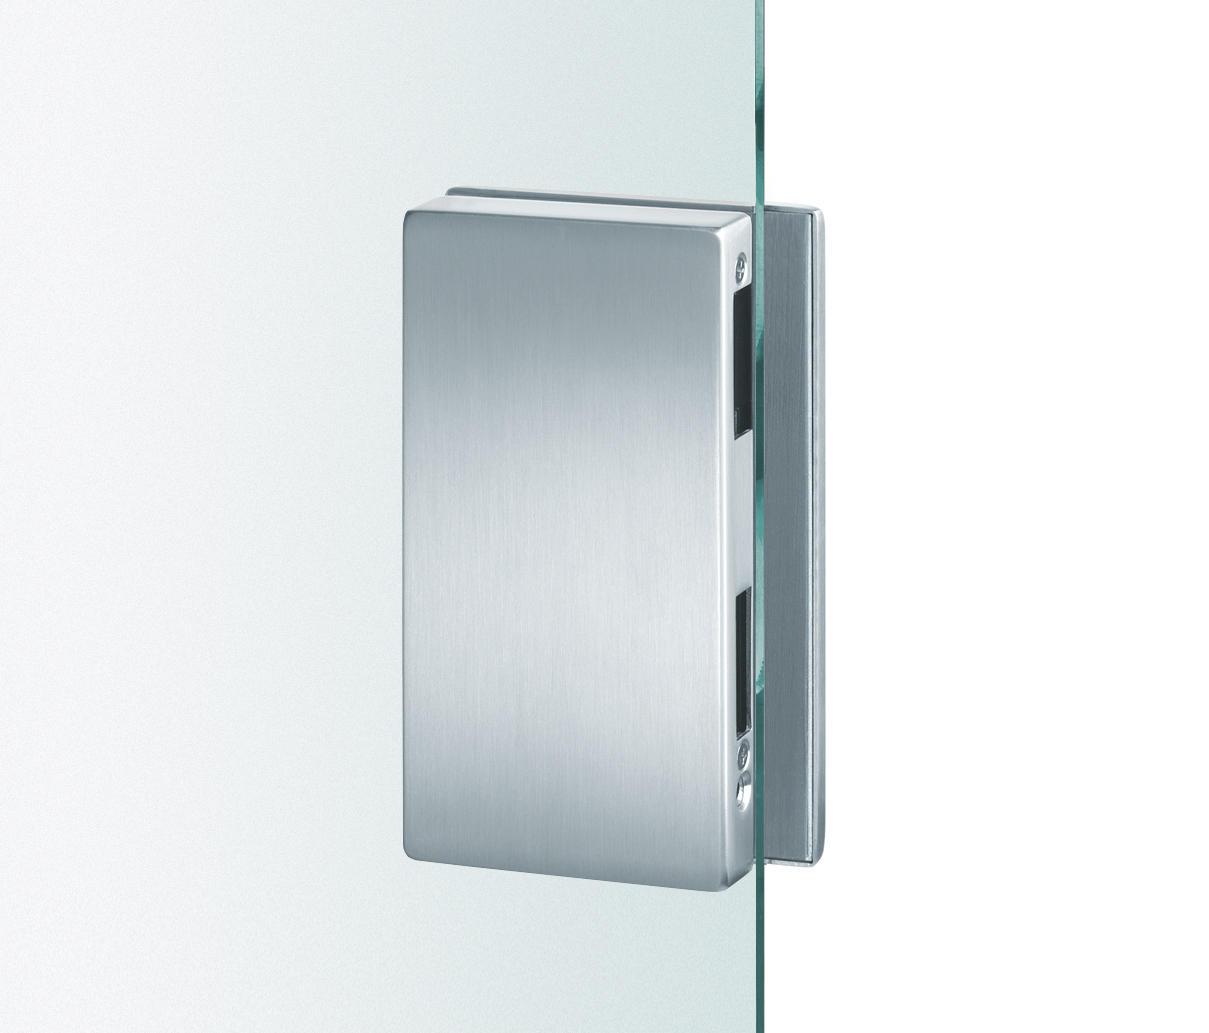 fsb 13 4220 glass door fitting handle sets for glass. Black Bedroom Furniture Sets. Home Design Ideas